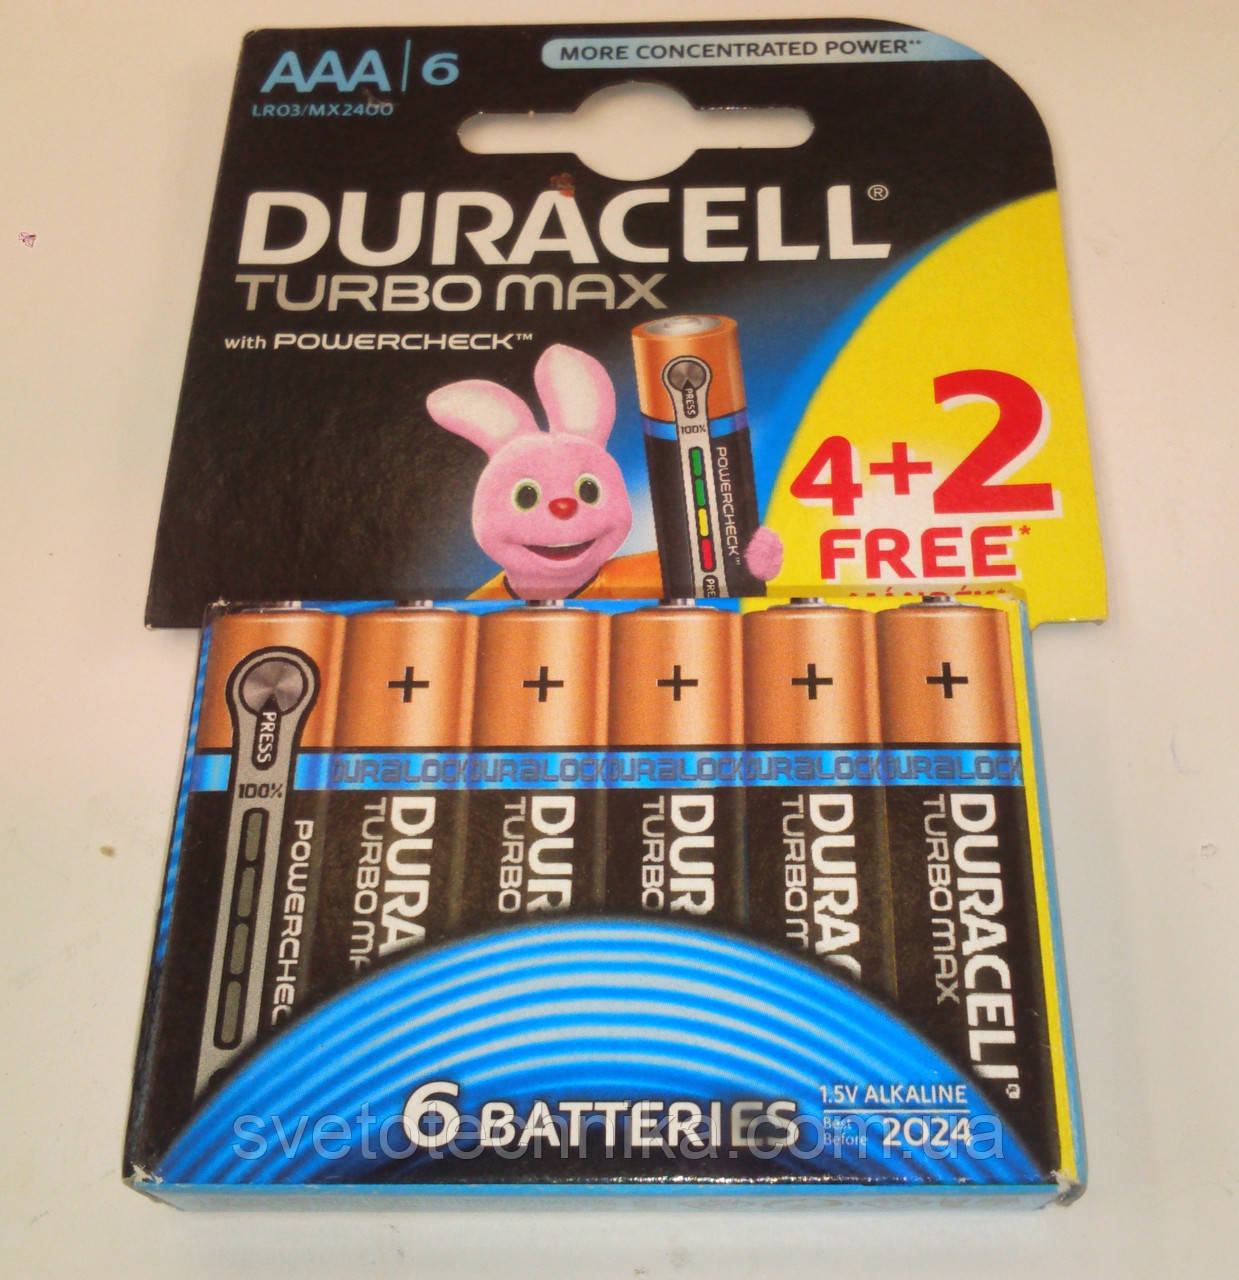 Батарейка щелочная (6шт.) Duracell Turbo R3 UM6 AAA 1.5V на блистере